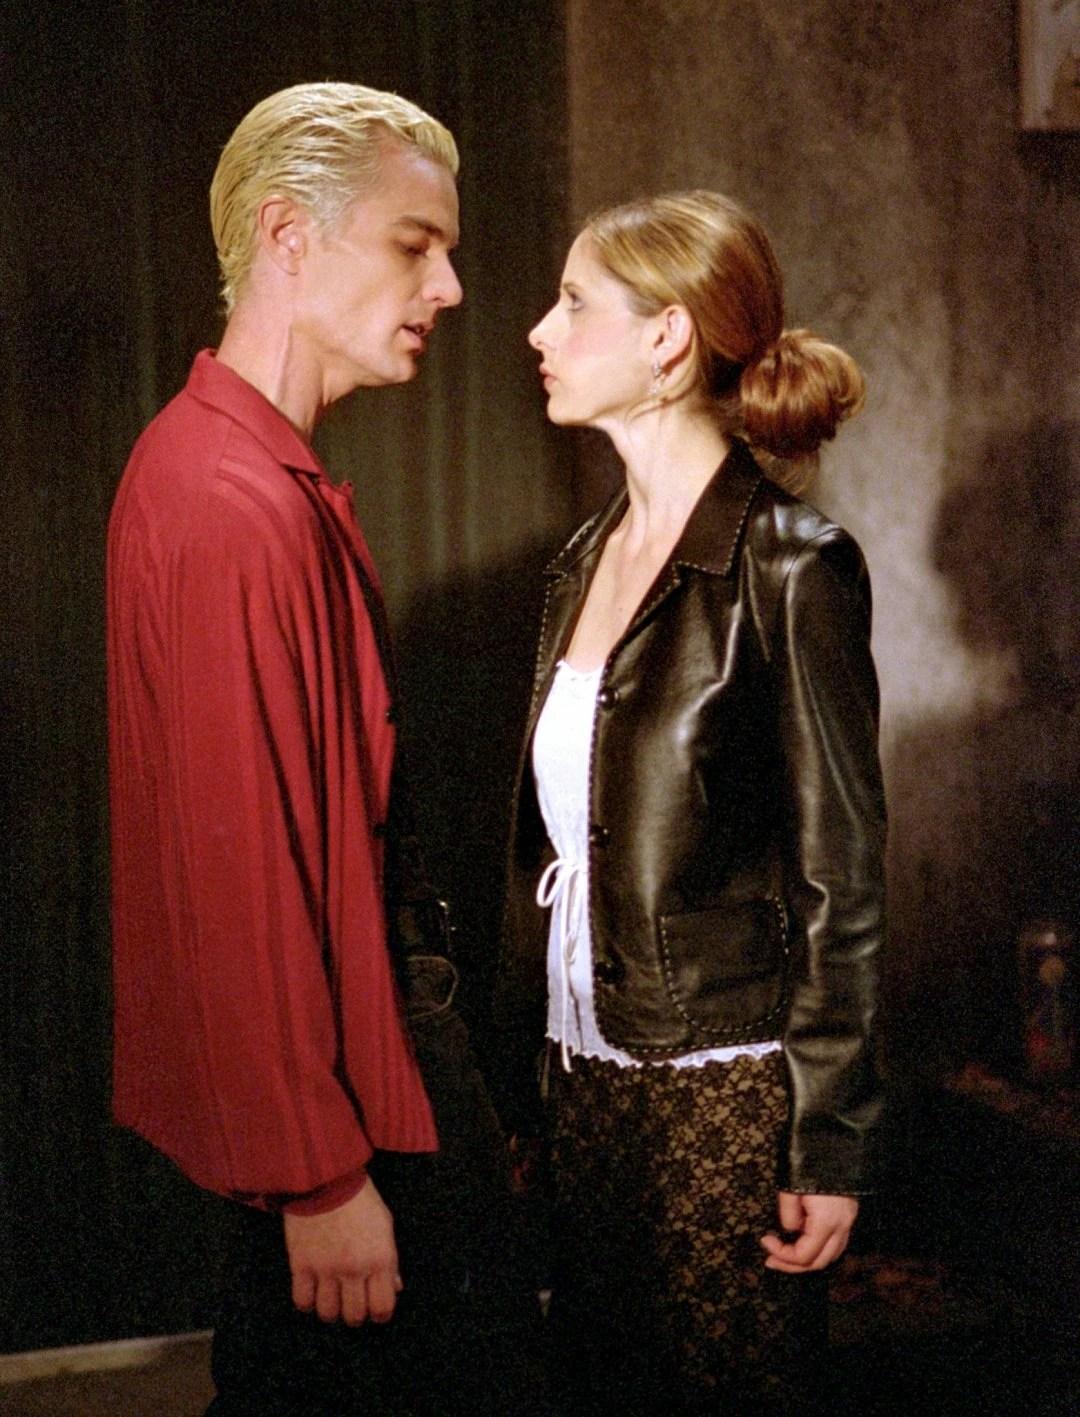 No one puts Buffy in a corner.